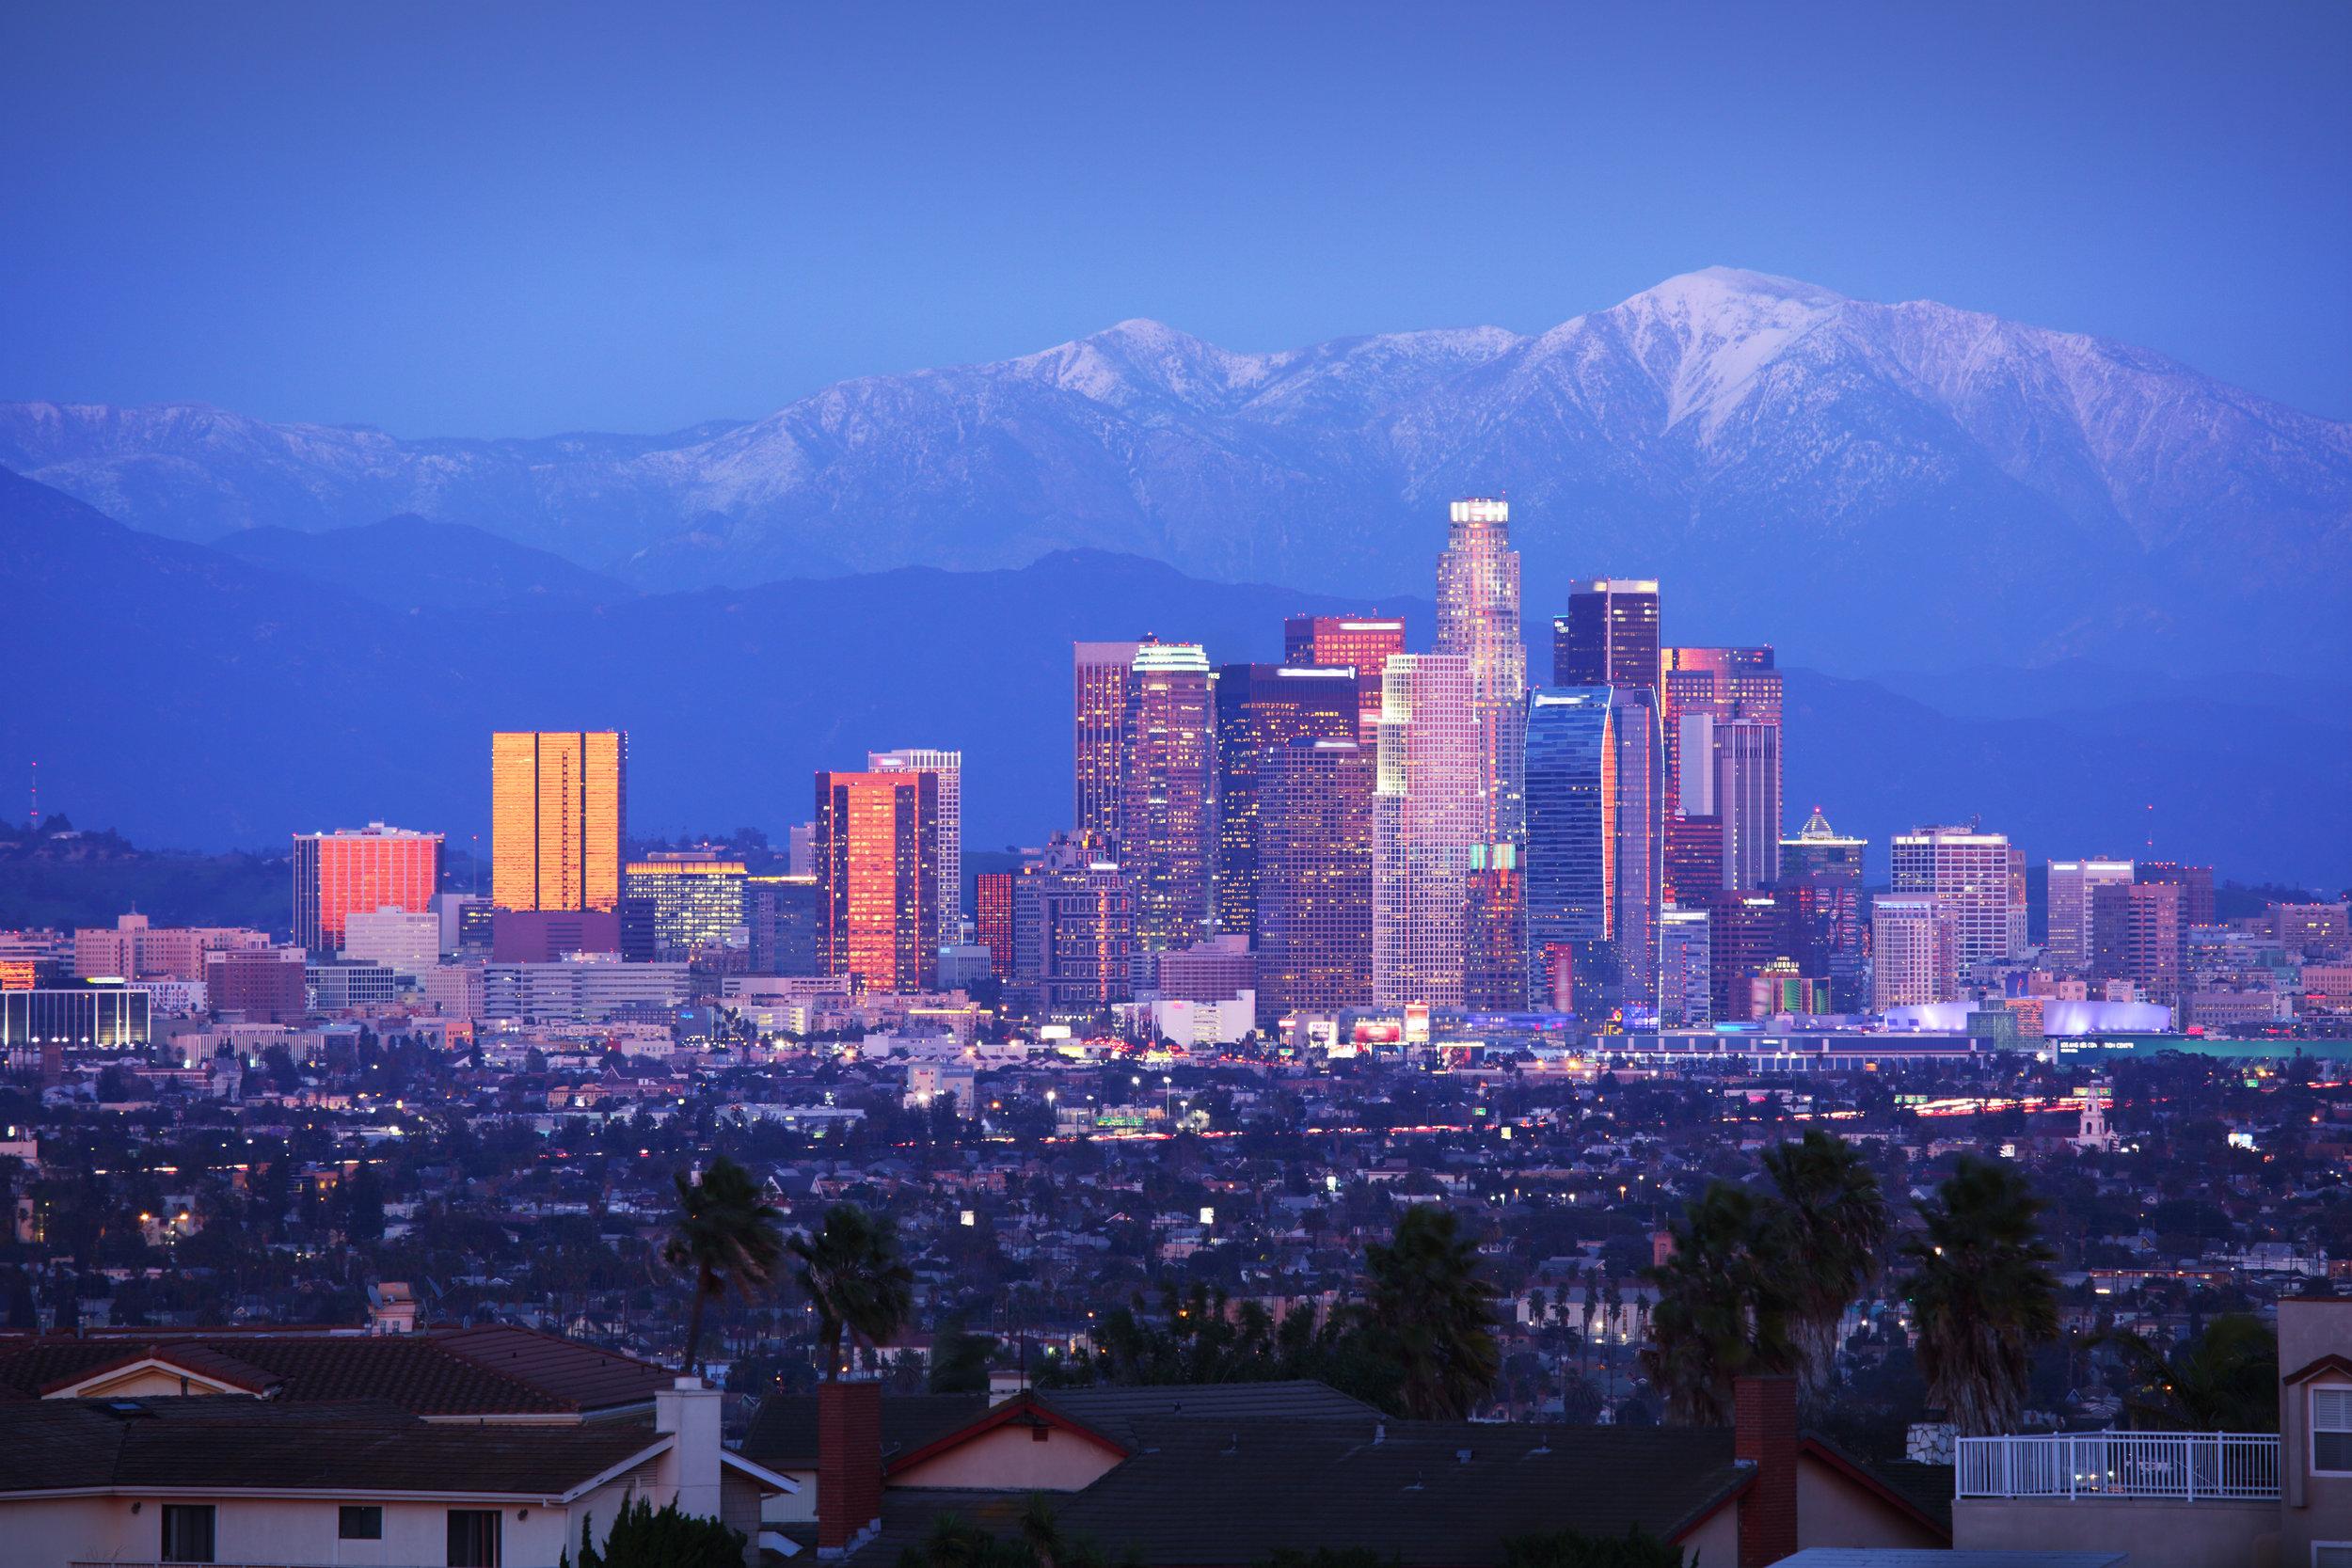 Los Angeles, CA - Downtown Dance & Movement: 1144 S. Hope St, Los Angeles 90015Sat, Jun 8th 10:30-3:30pmSun, Jun 9th 10:30-3:30pm